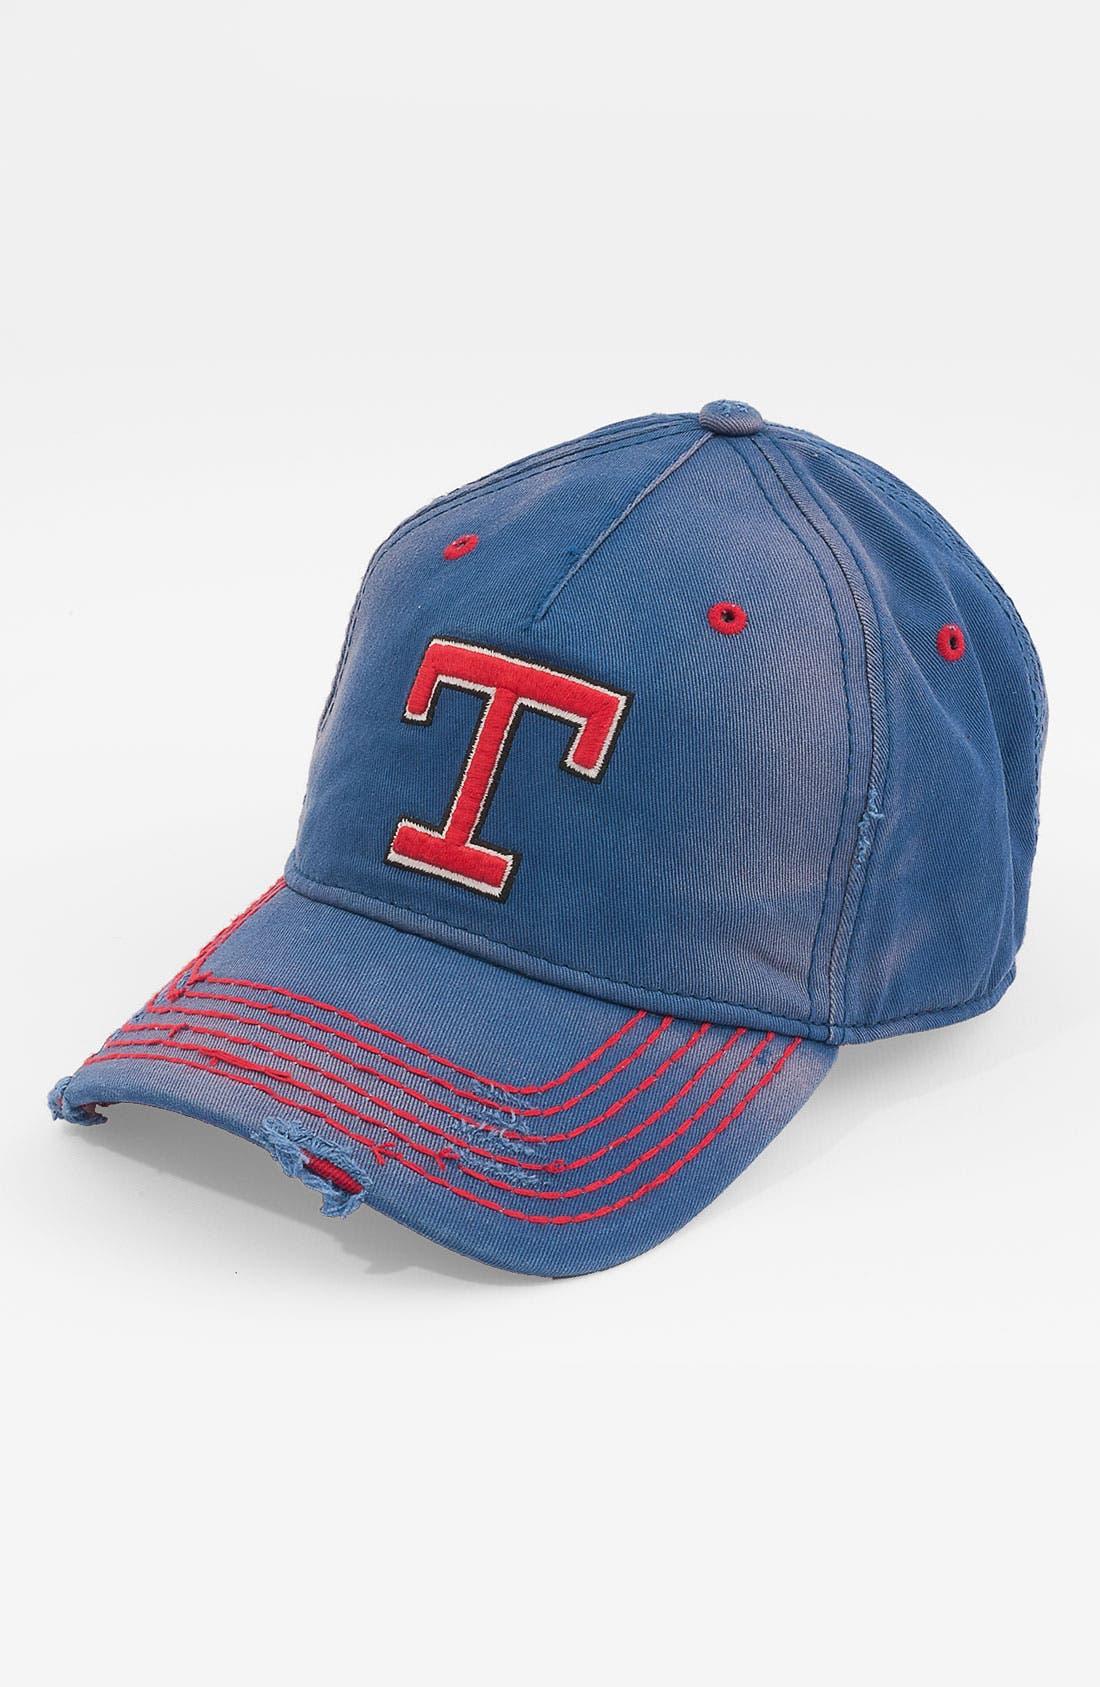 Main Image - American Needle 'Texas Rangers' Baseball Cap